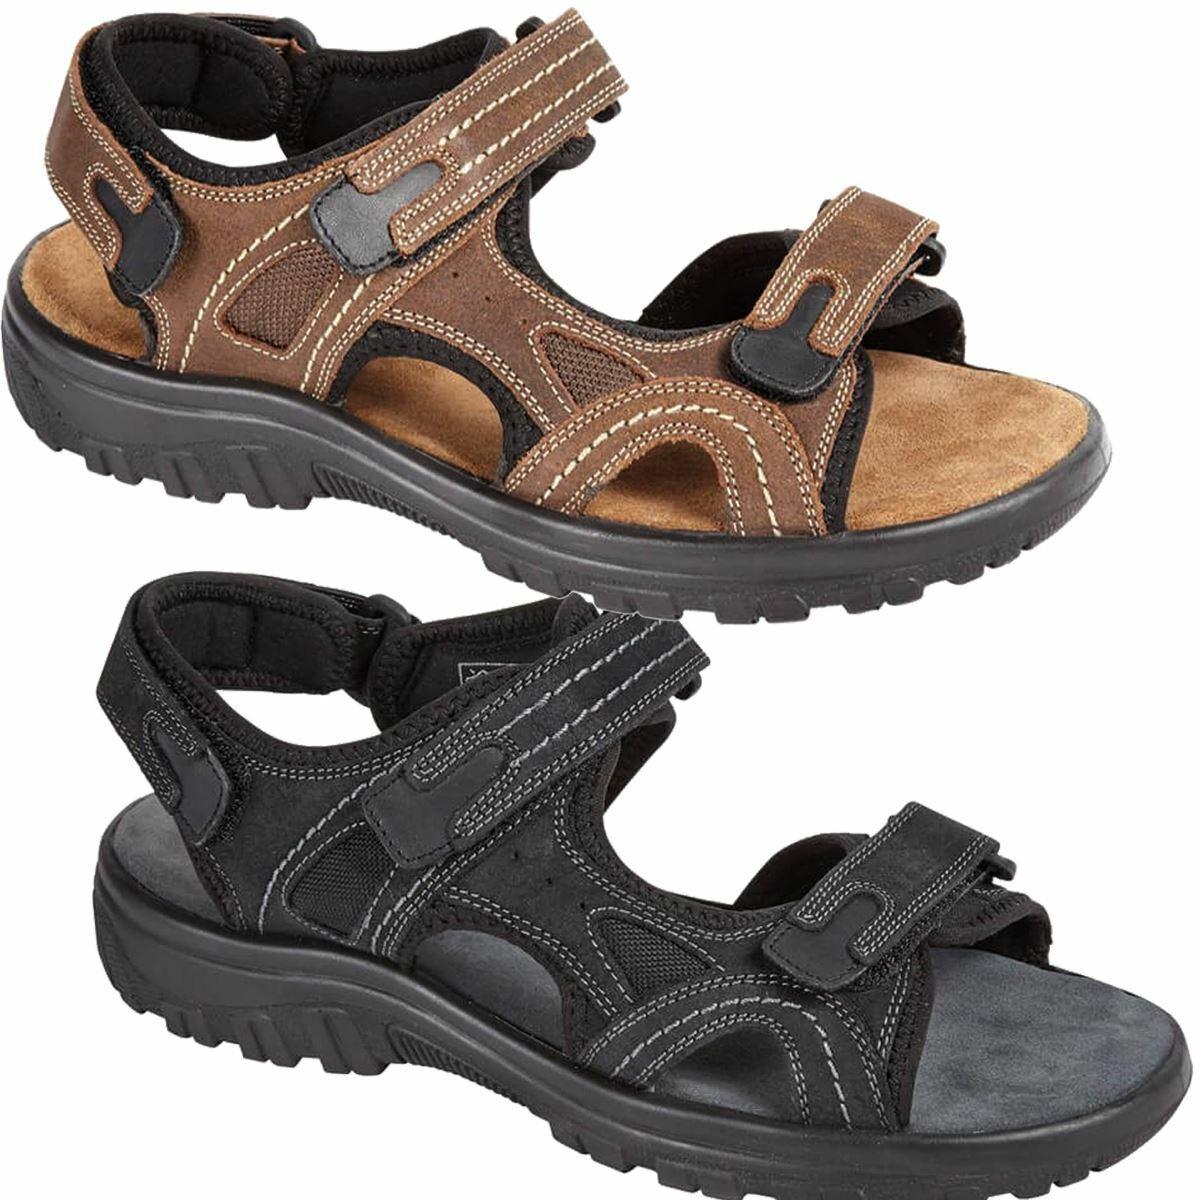 Men's Faux Leather Strap Breathable Lightweight Walking Shoes Sandals